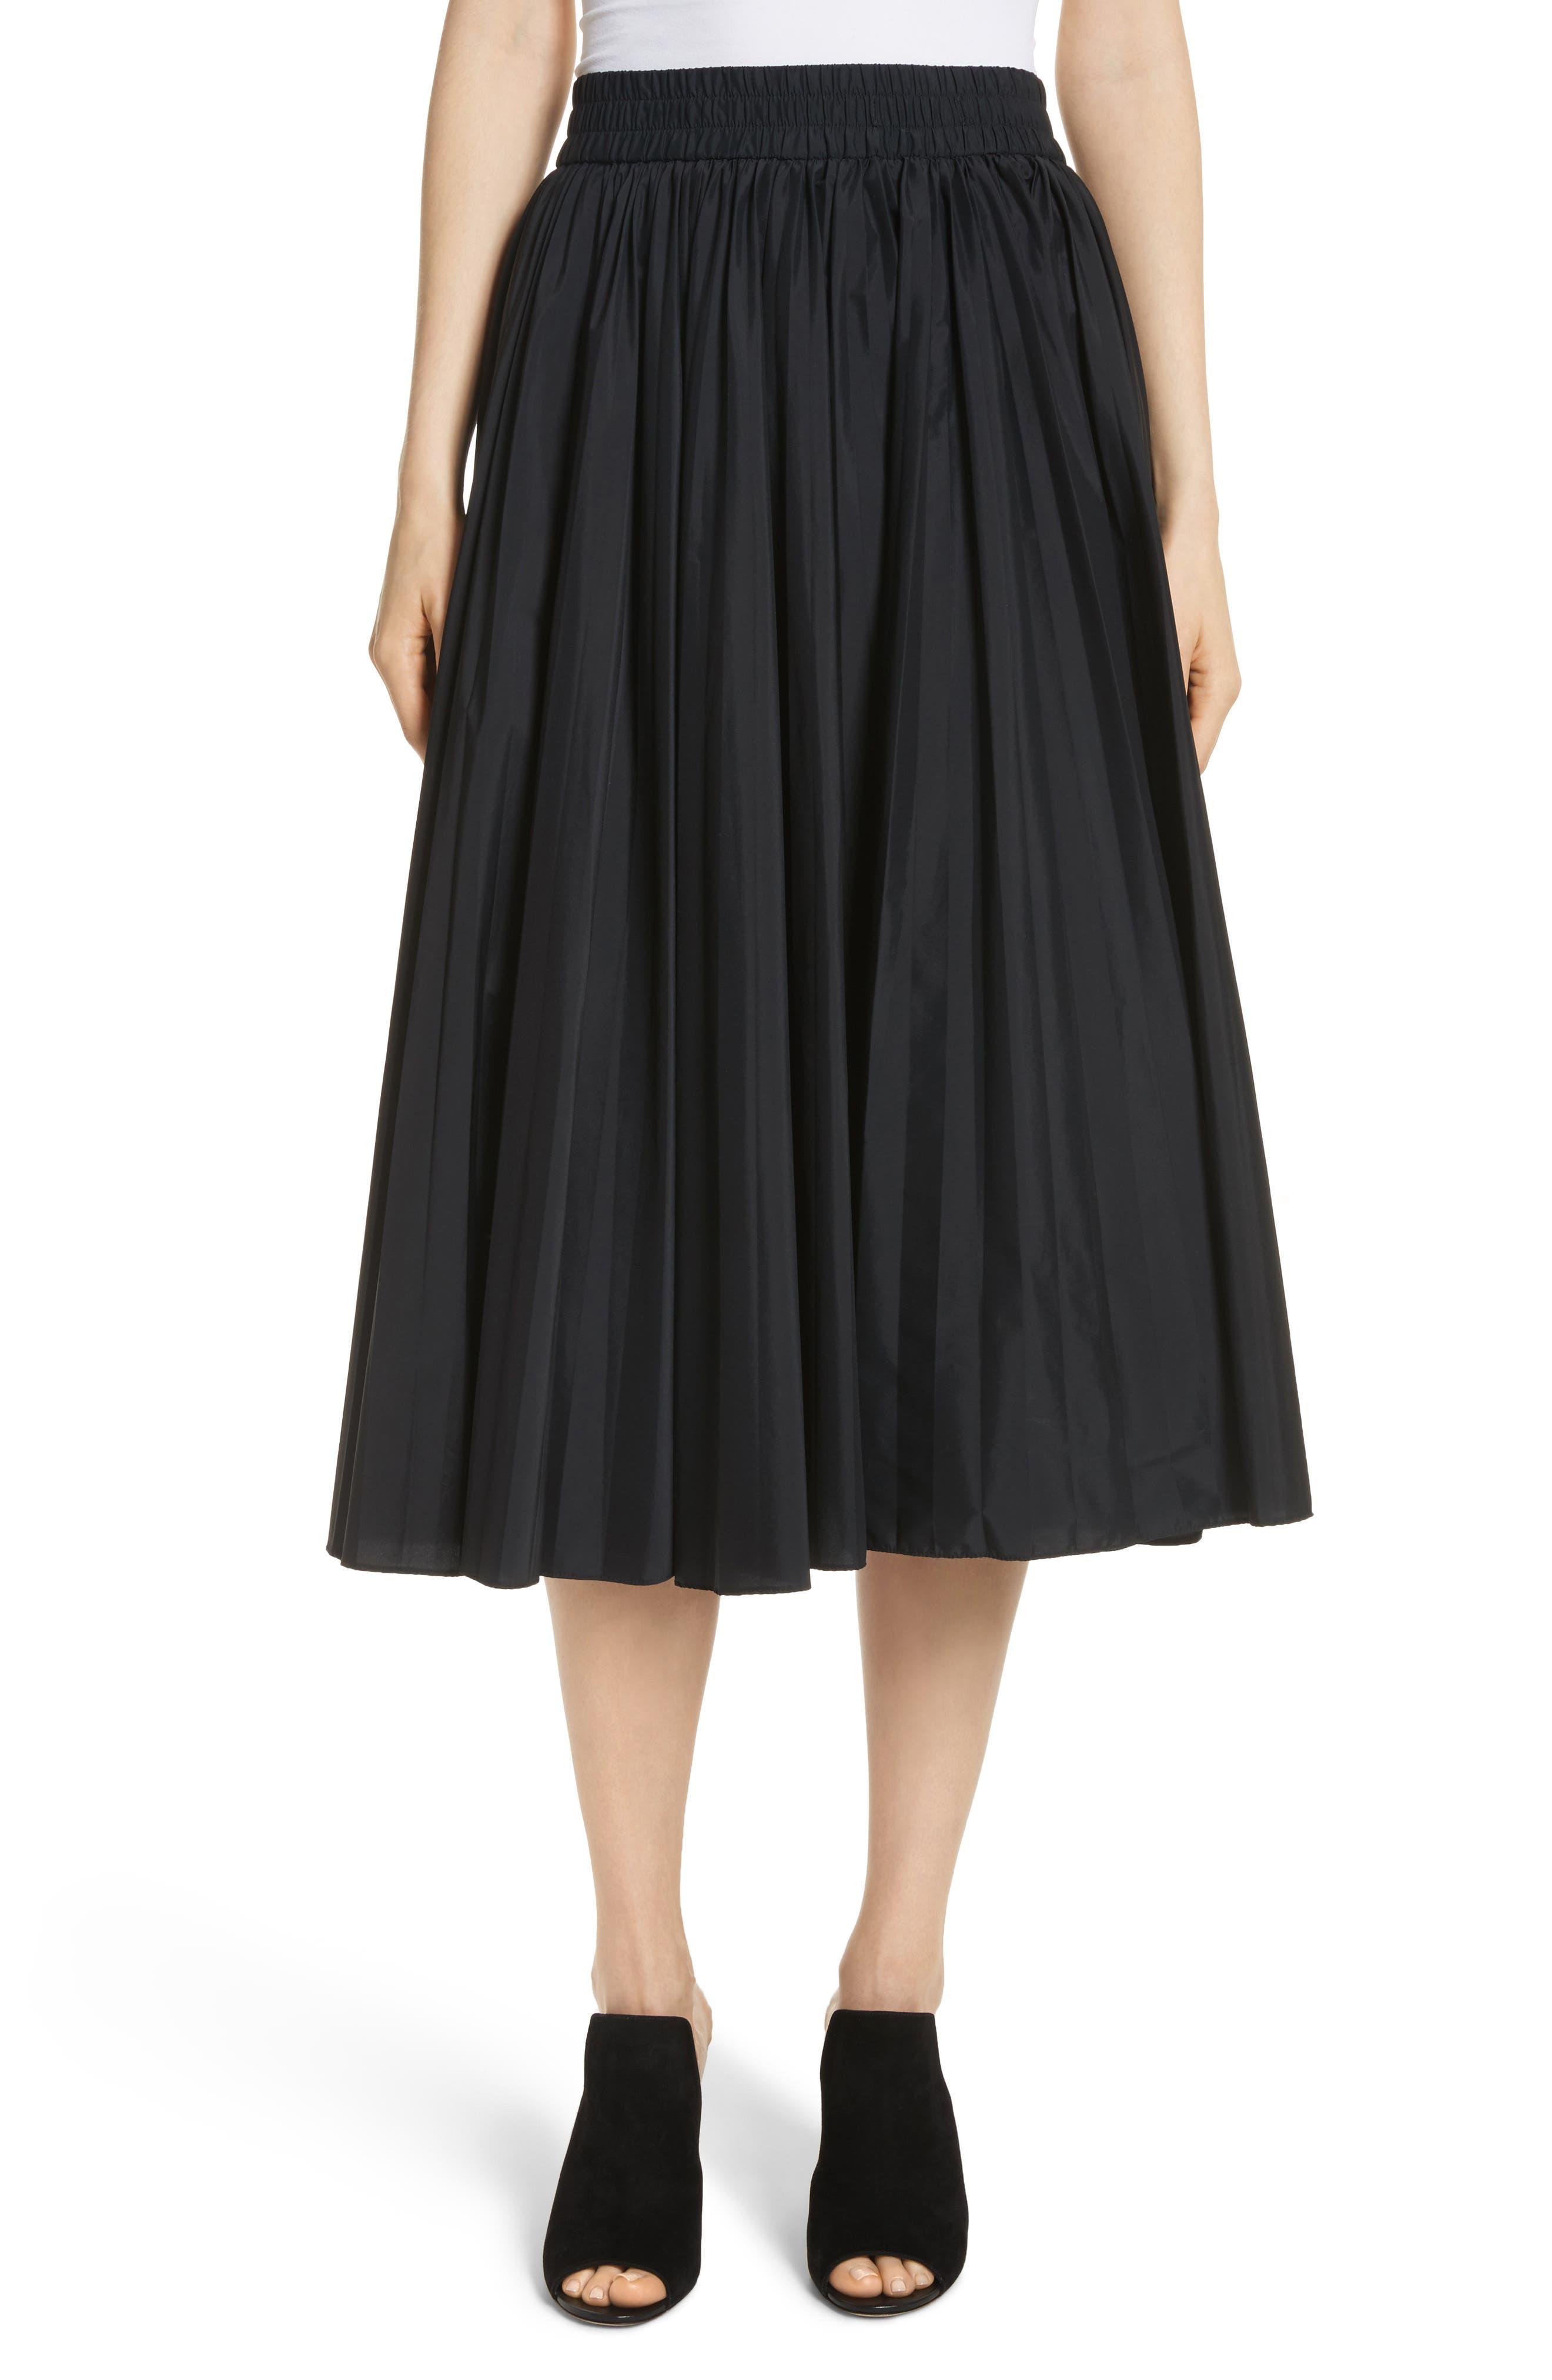 Alternate Image 1 Selected - RED Valentino Pleated Midi Skirt